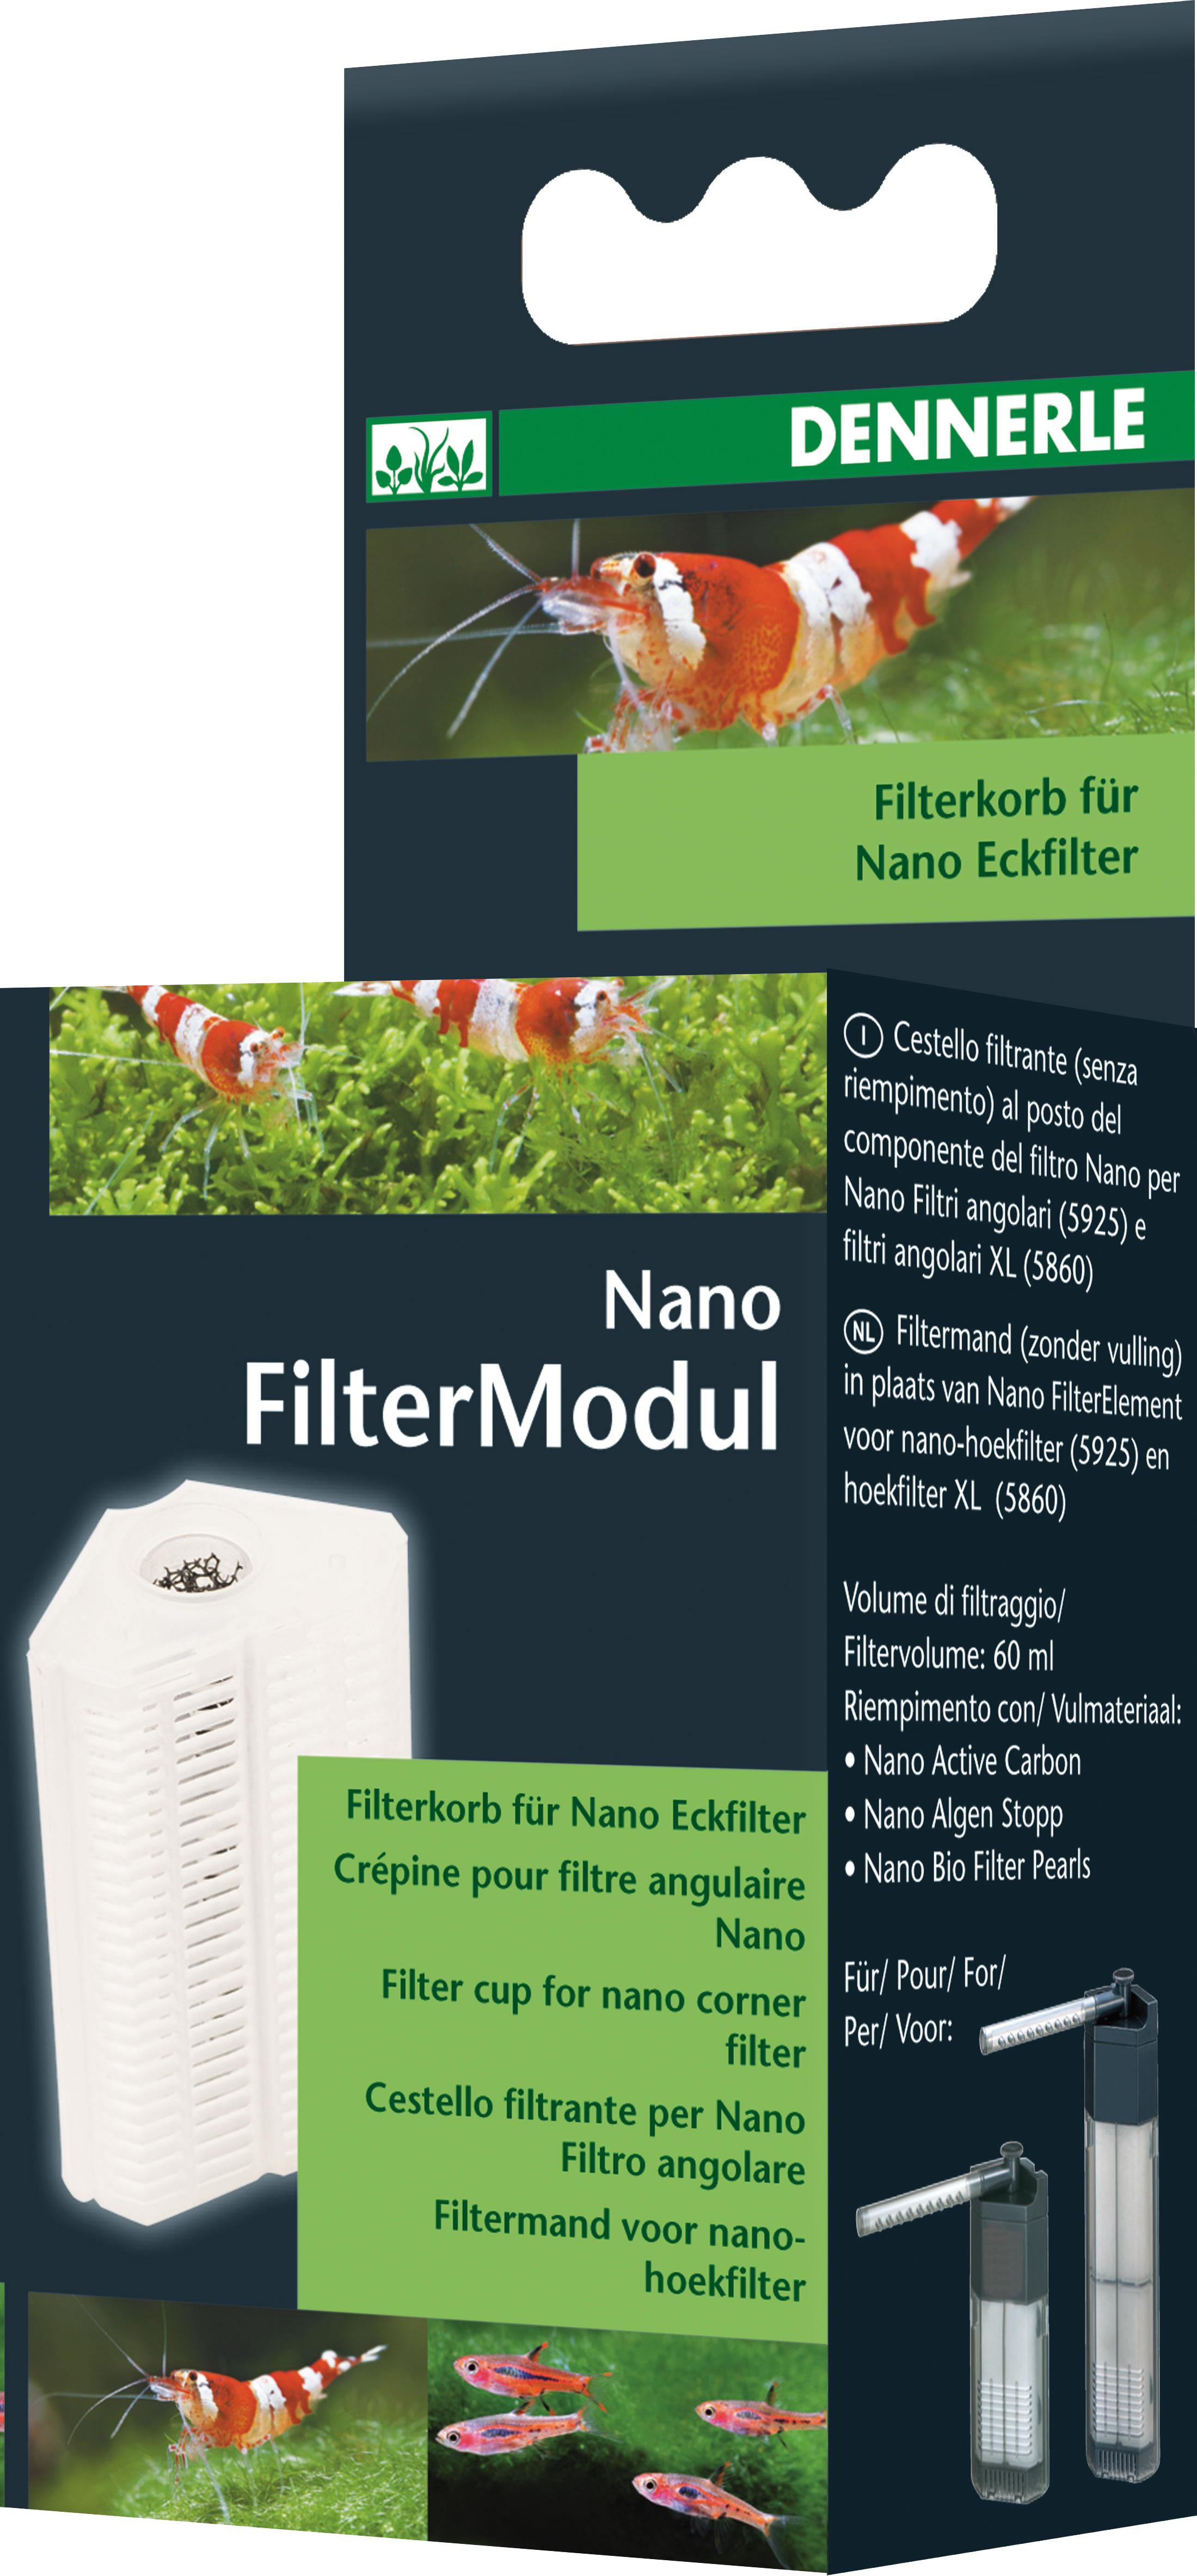 Dennerle Nano FilterModul f�r Dennerle Nano Eckfilter